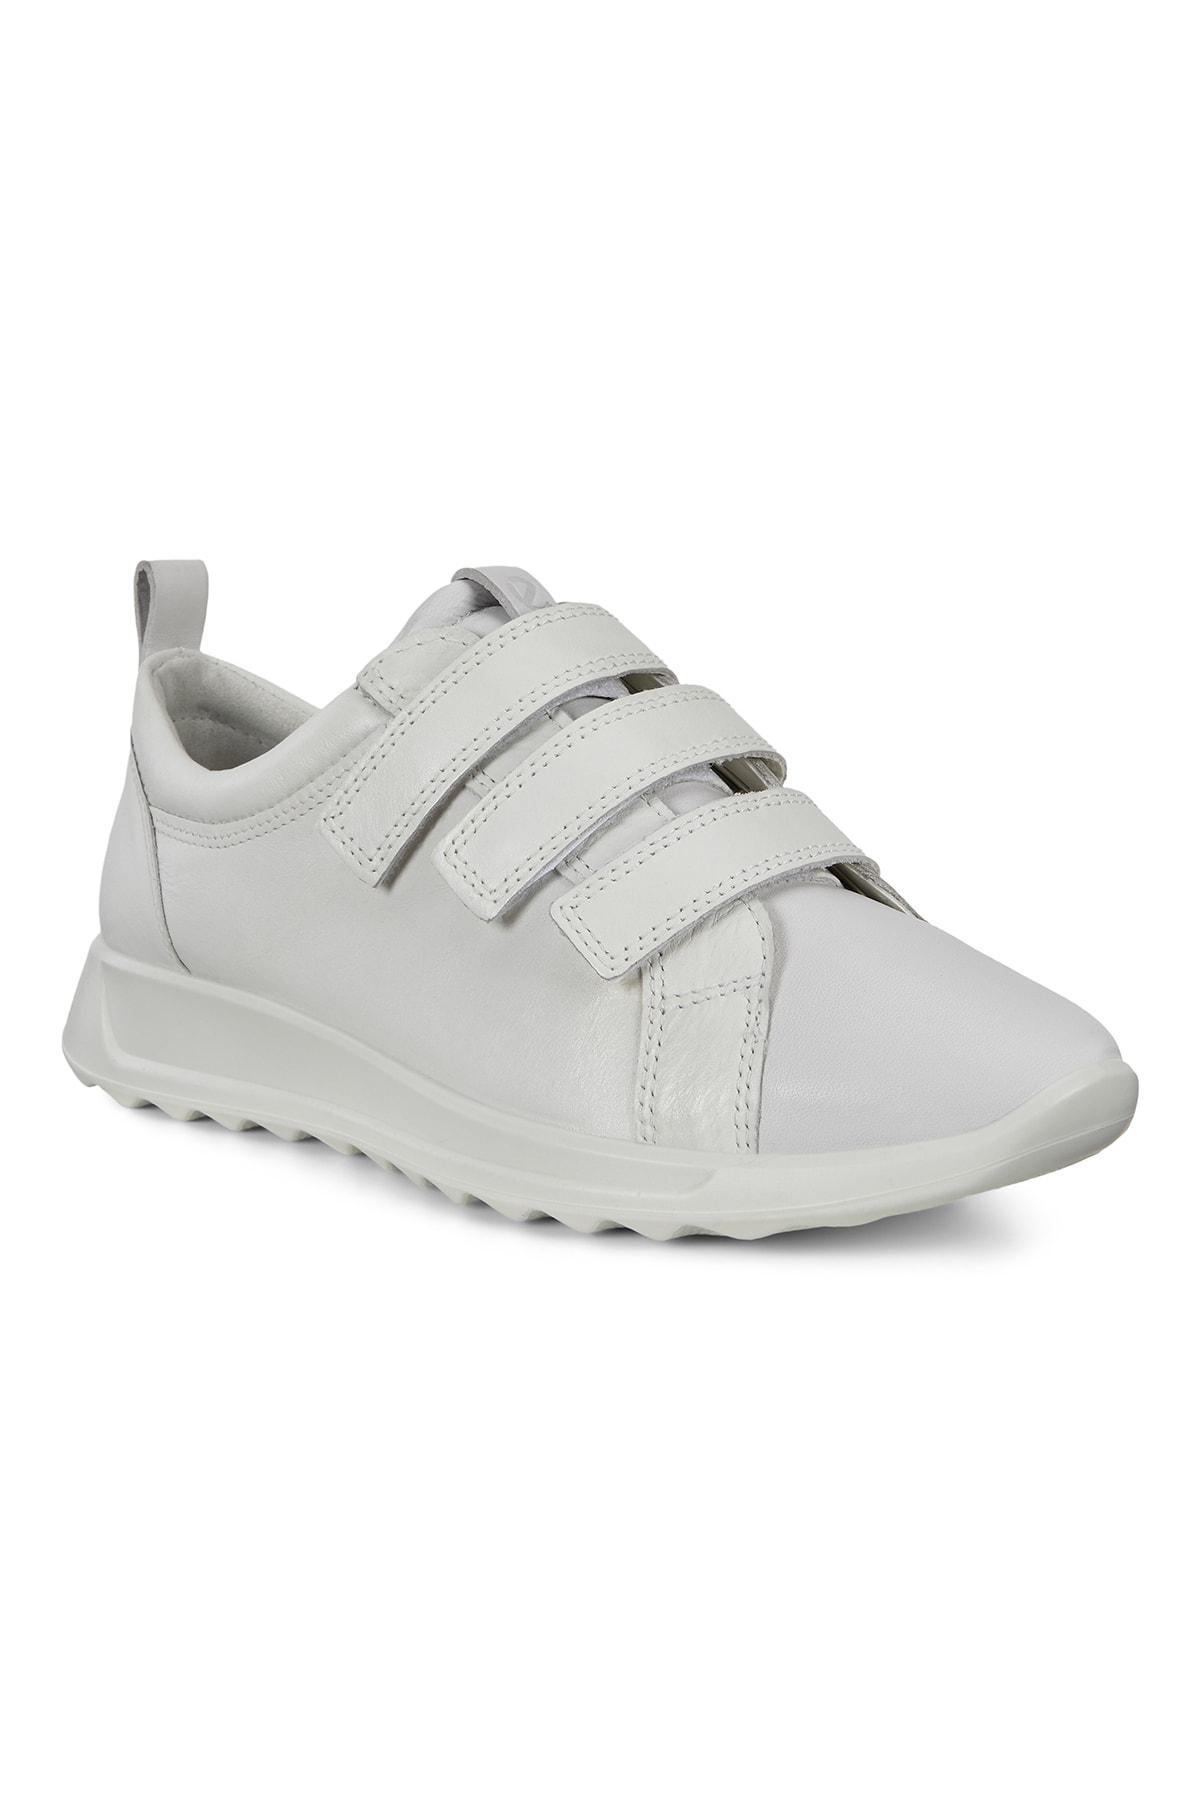 Ecco Kadın Sneaker Flexure Runner W White Beyaz 292353